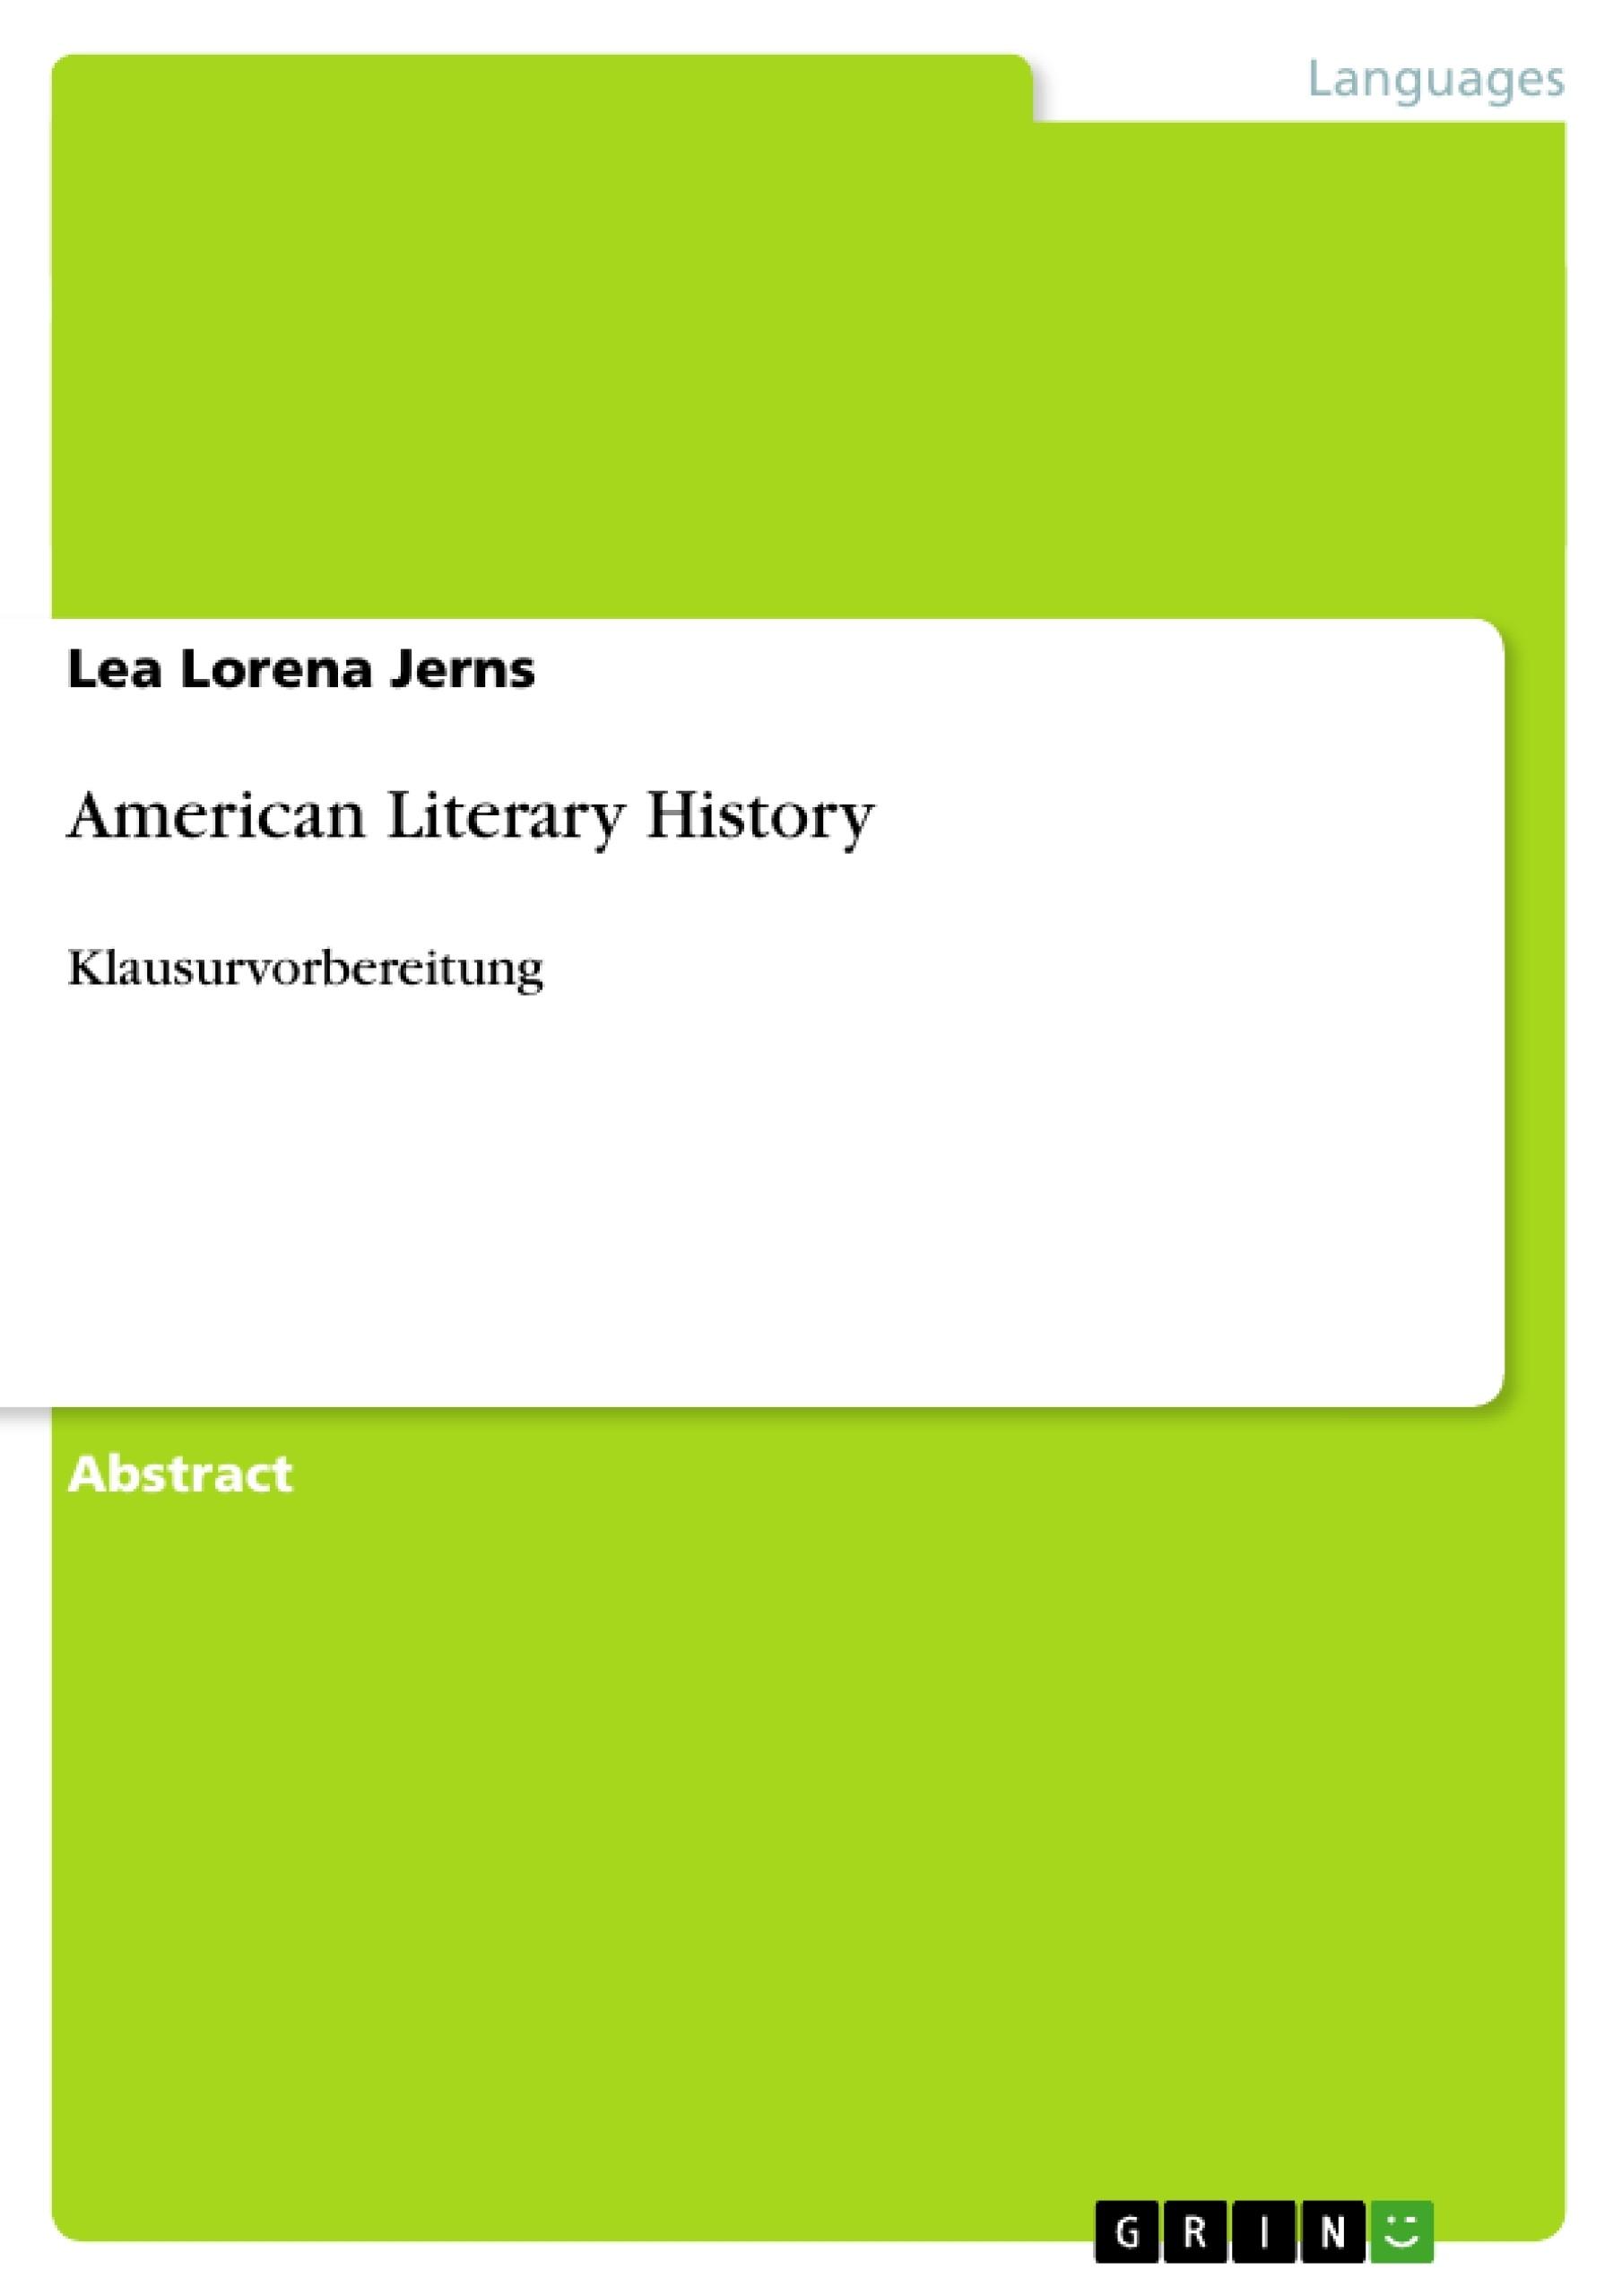 Title: American Literary History